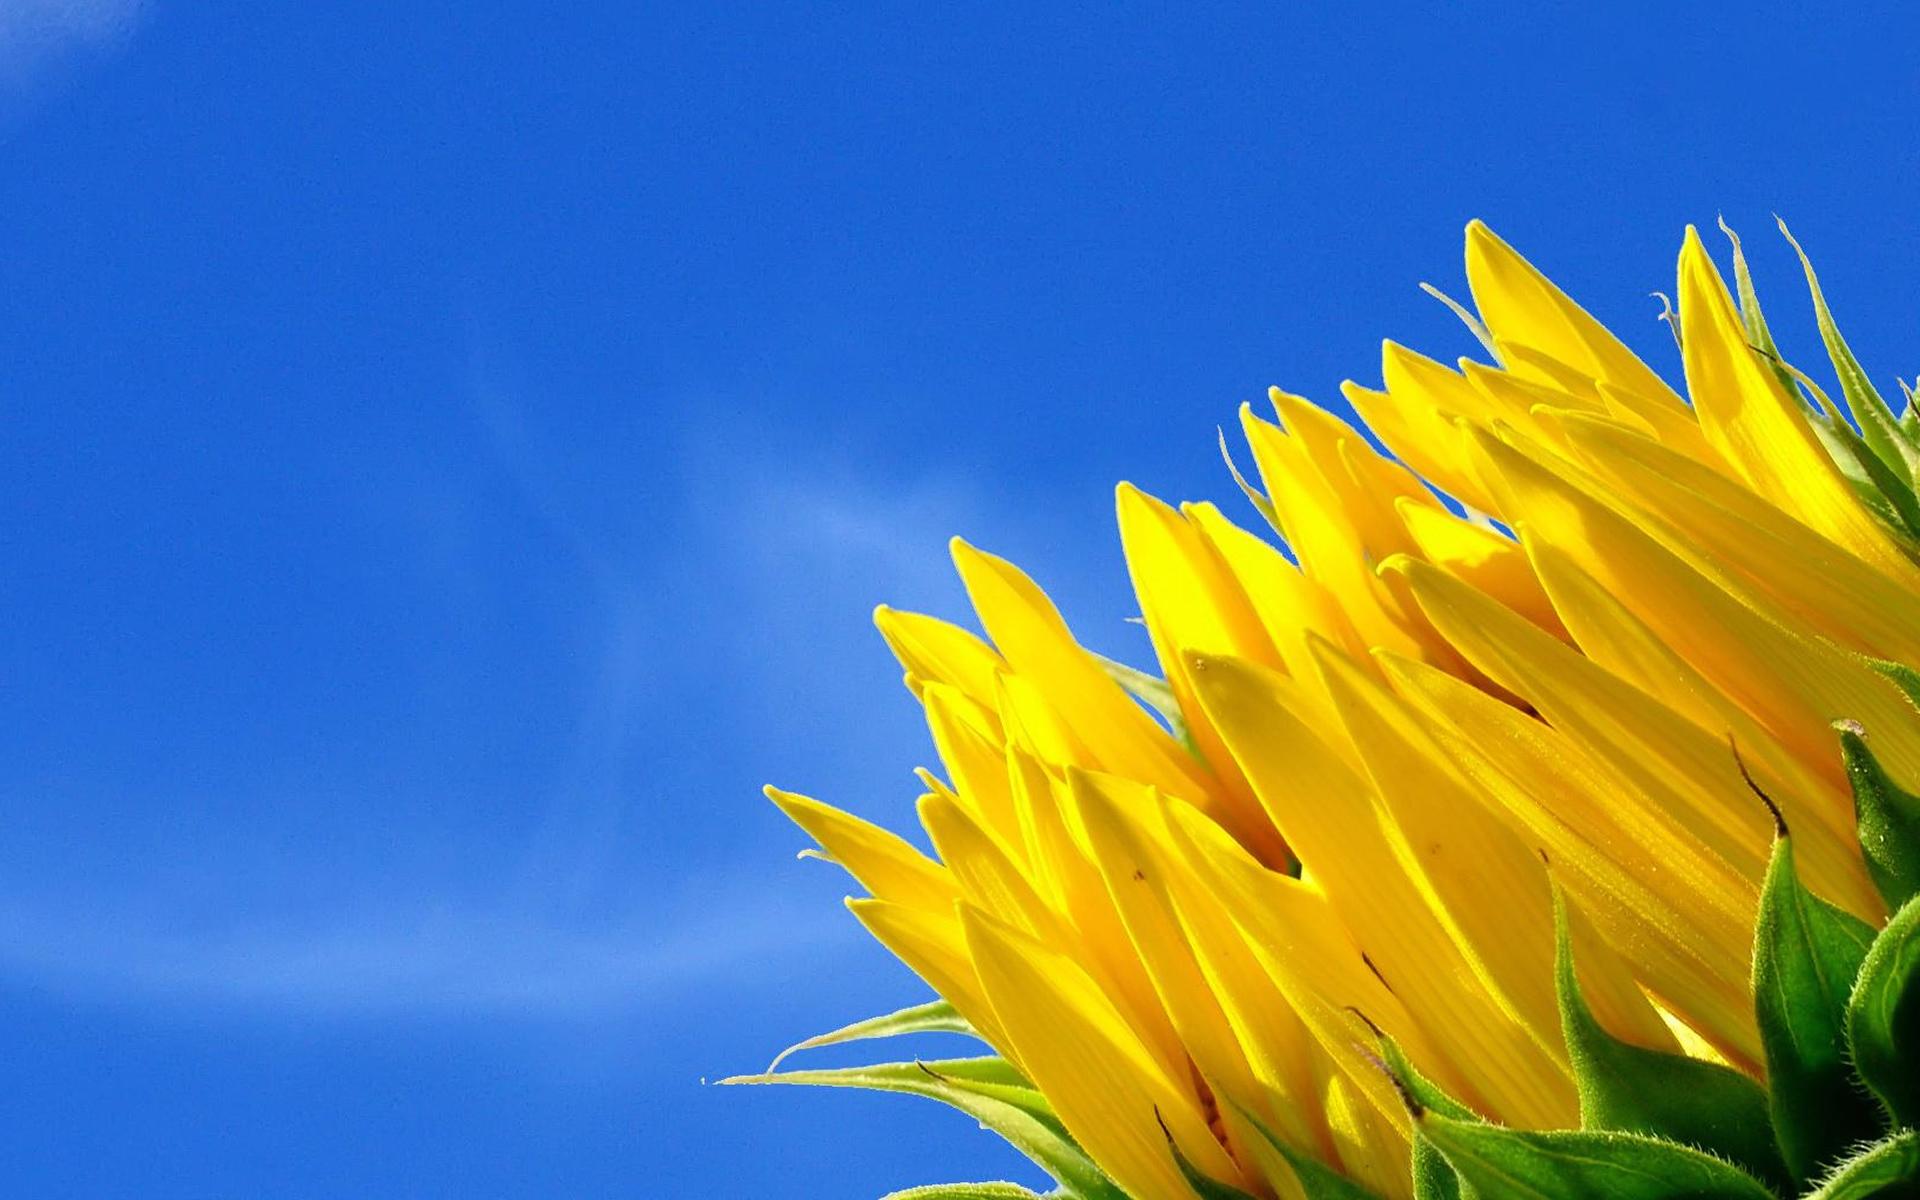 Blue And Yellow Flower Wallpaper 13 Desktop Background